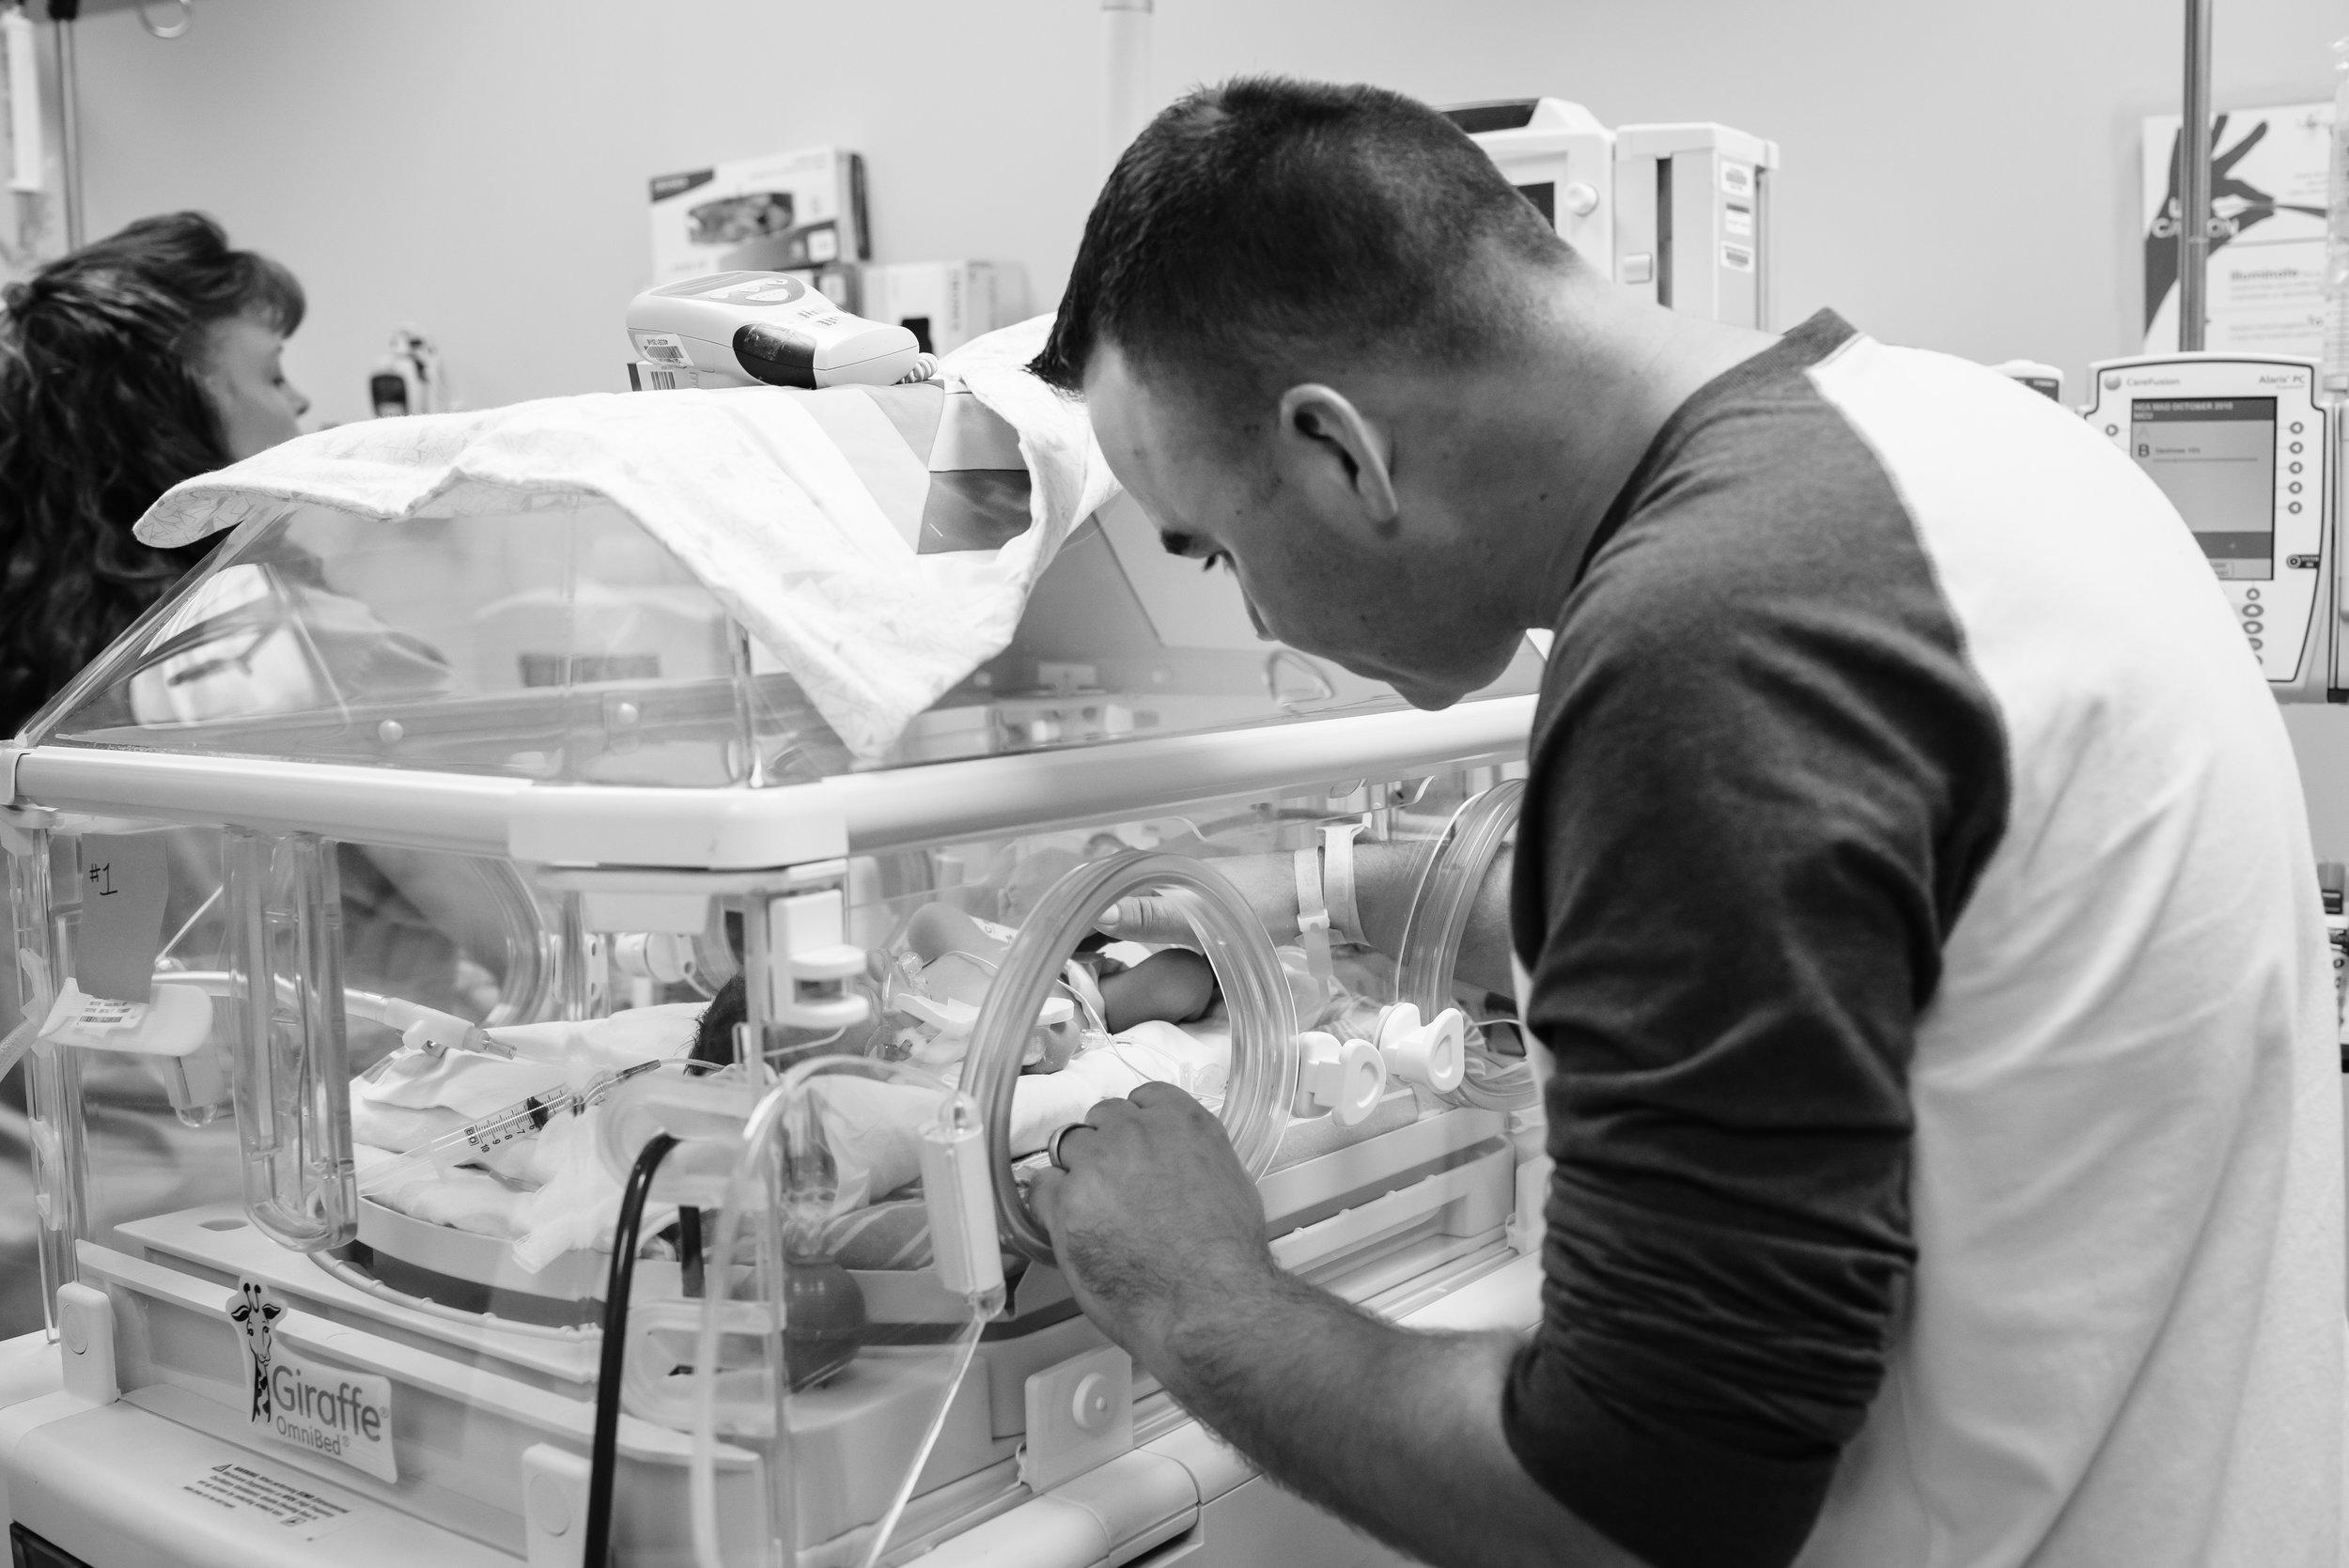 triplet birth and fresh 48